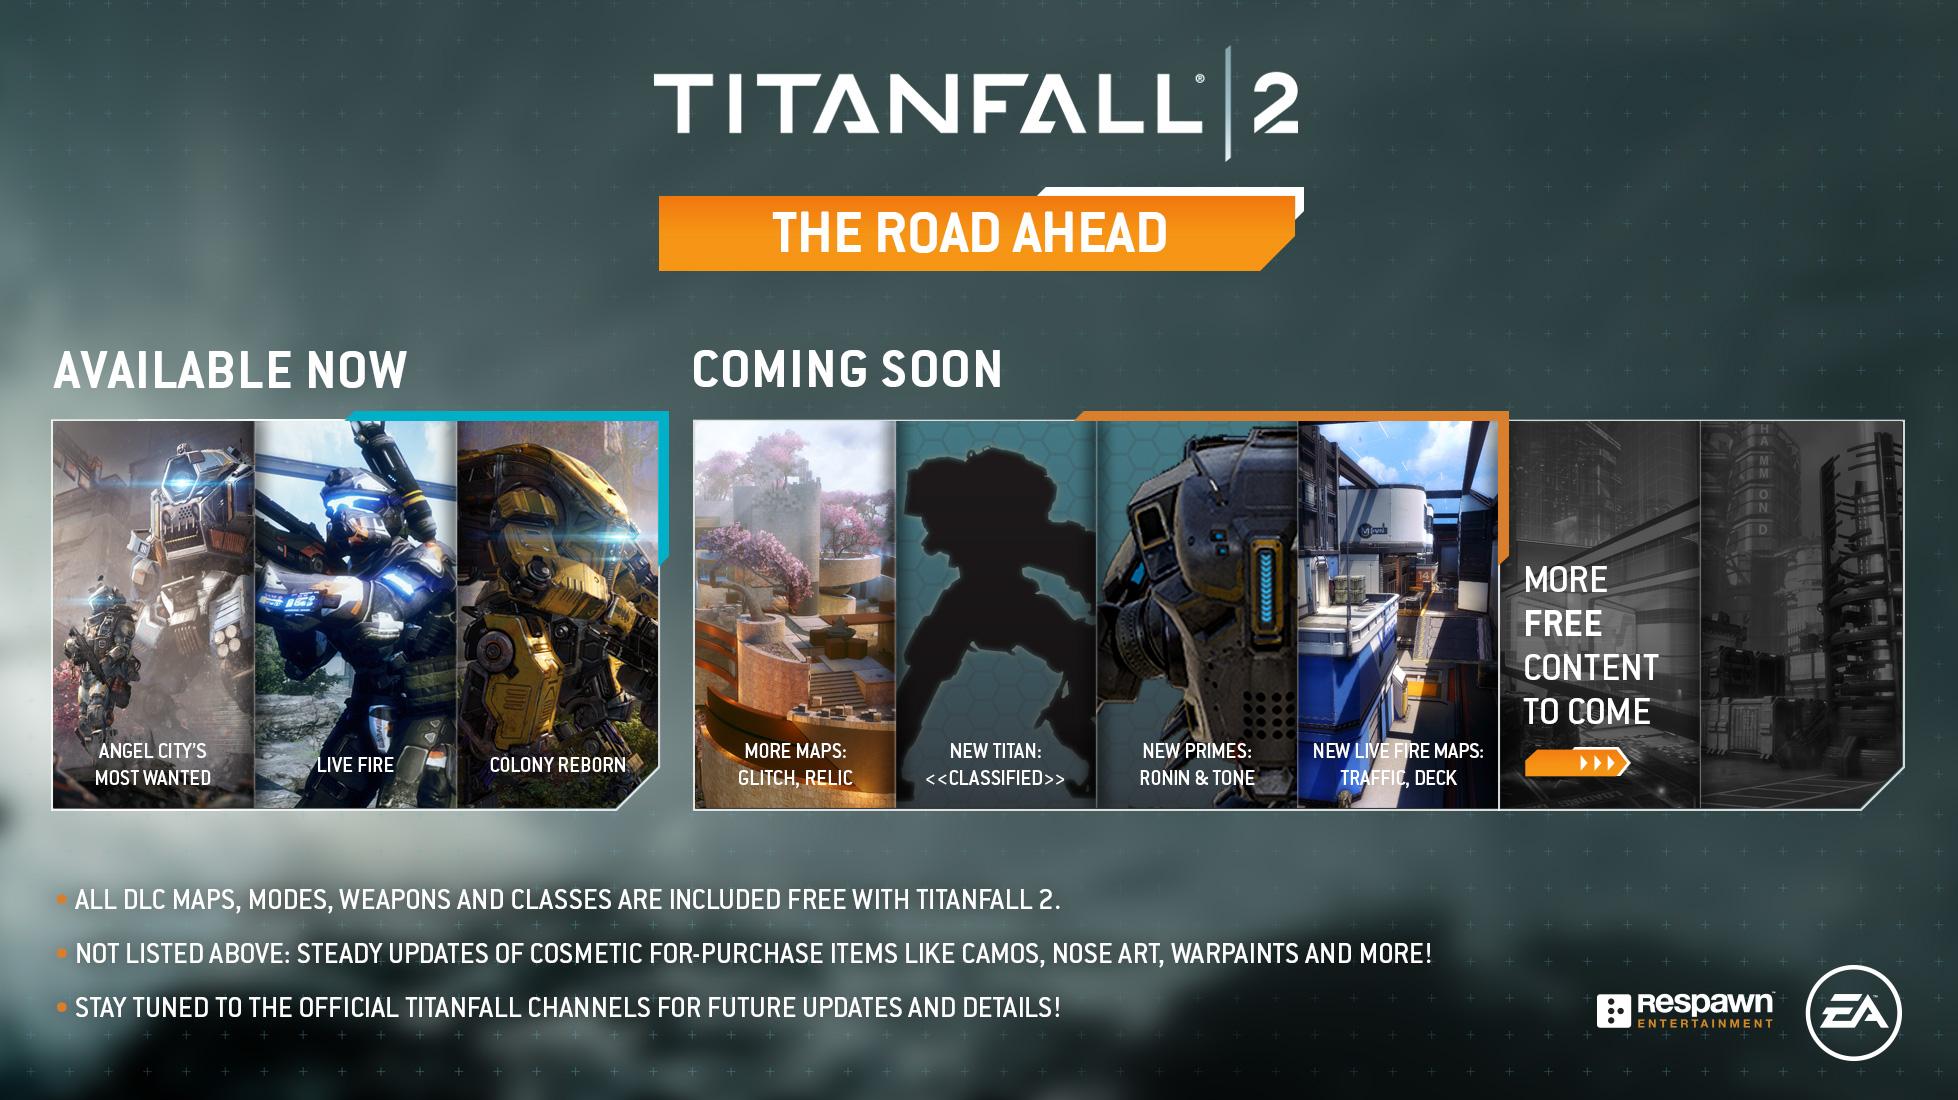 titanfall_2_road_ahead_1